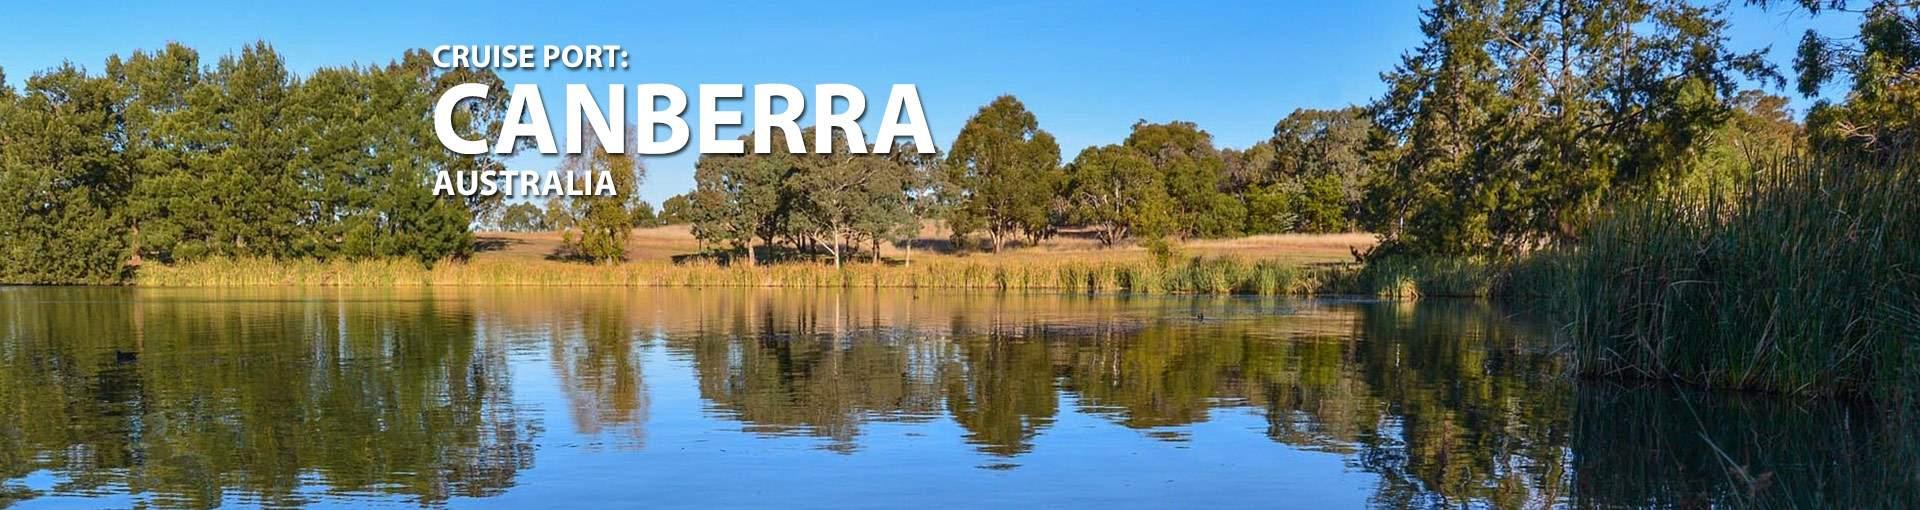 Canberra, Australia Cruise Port